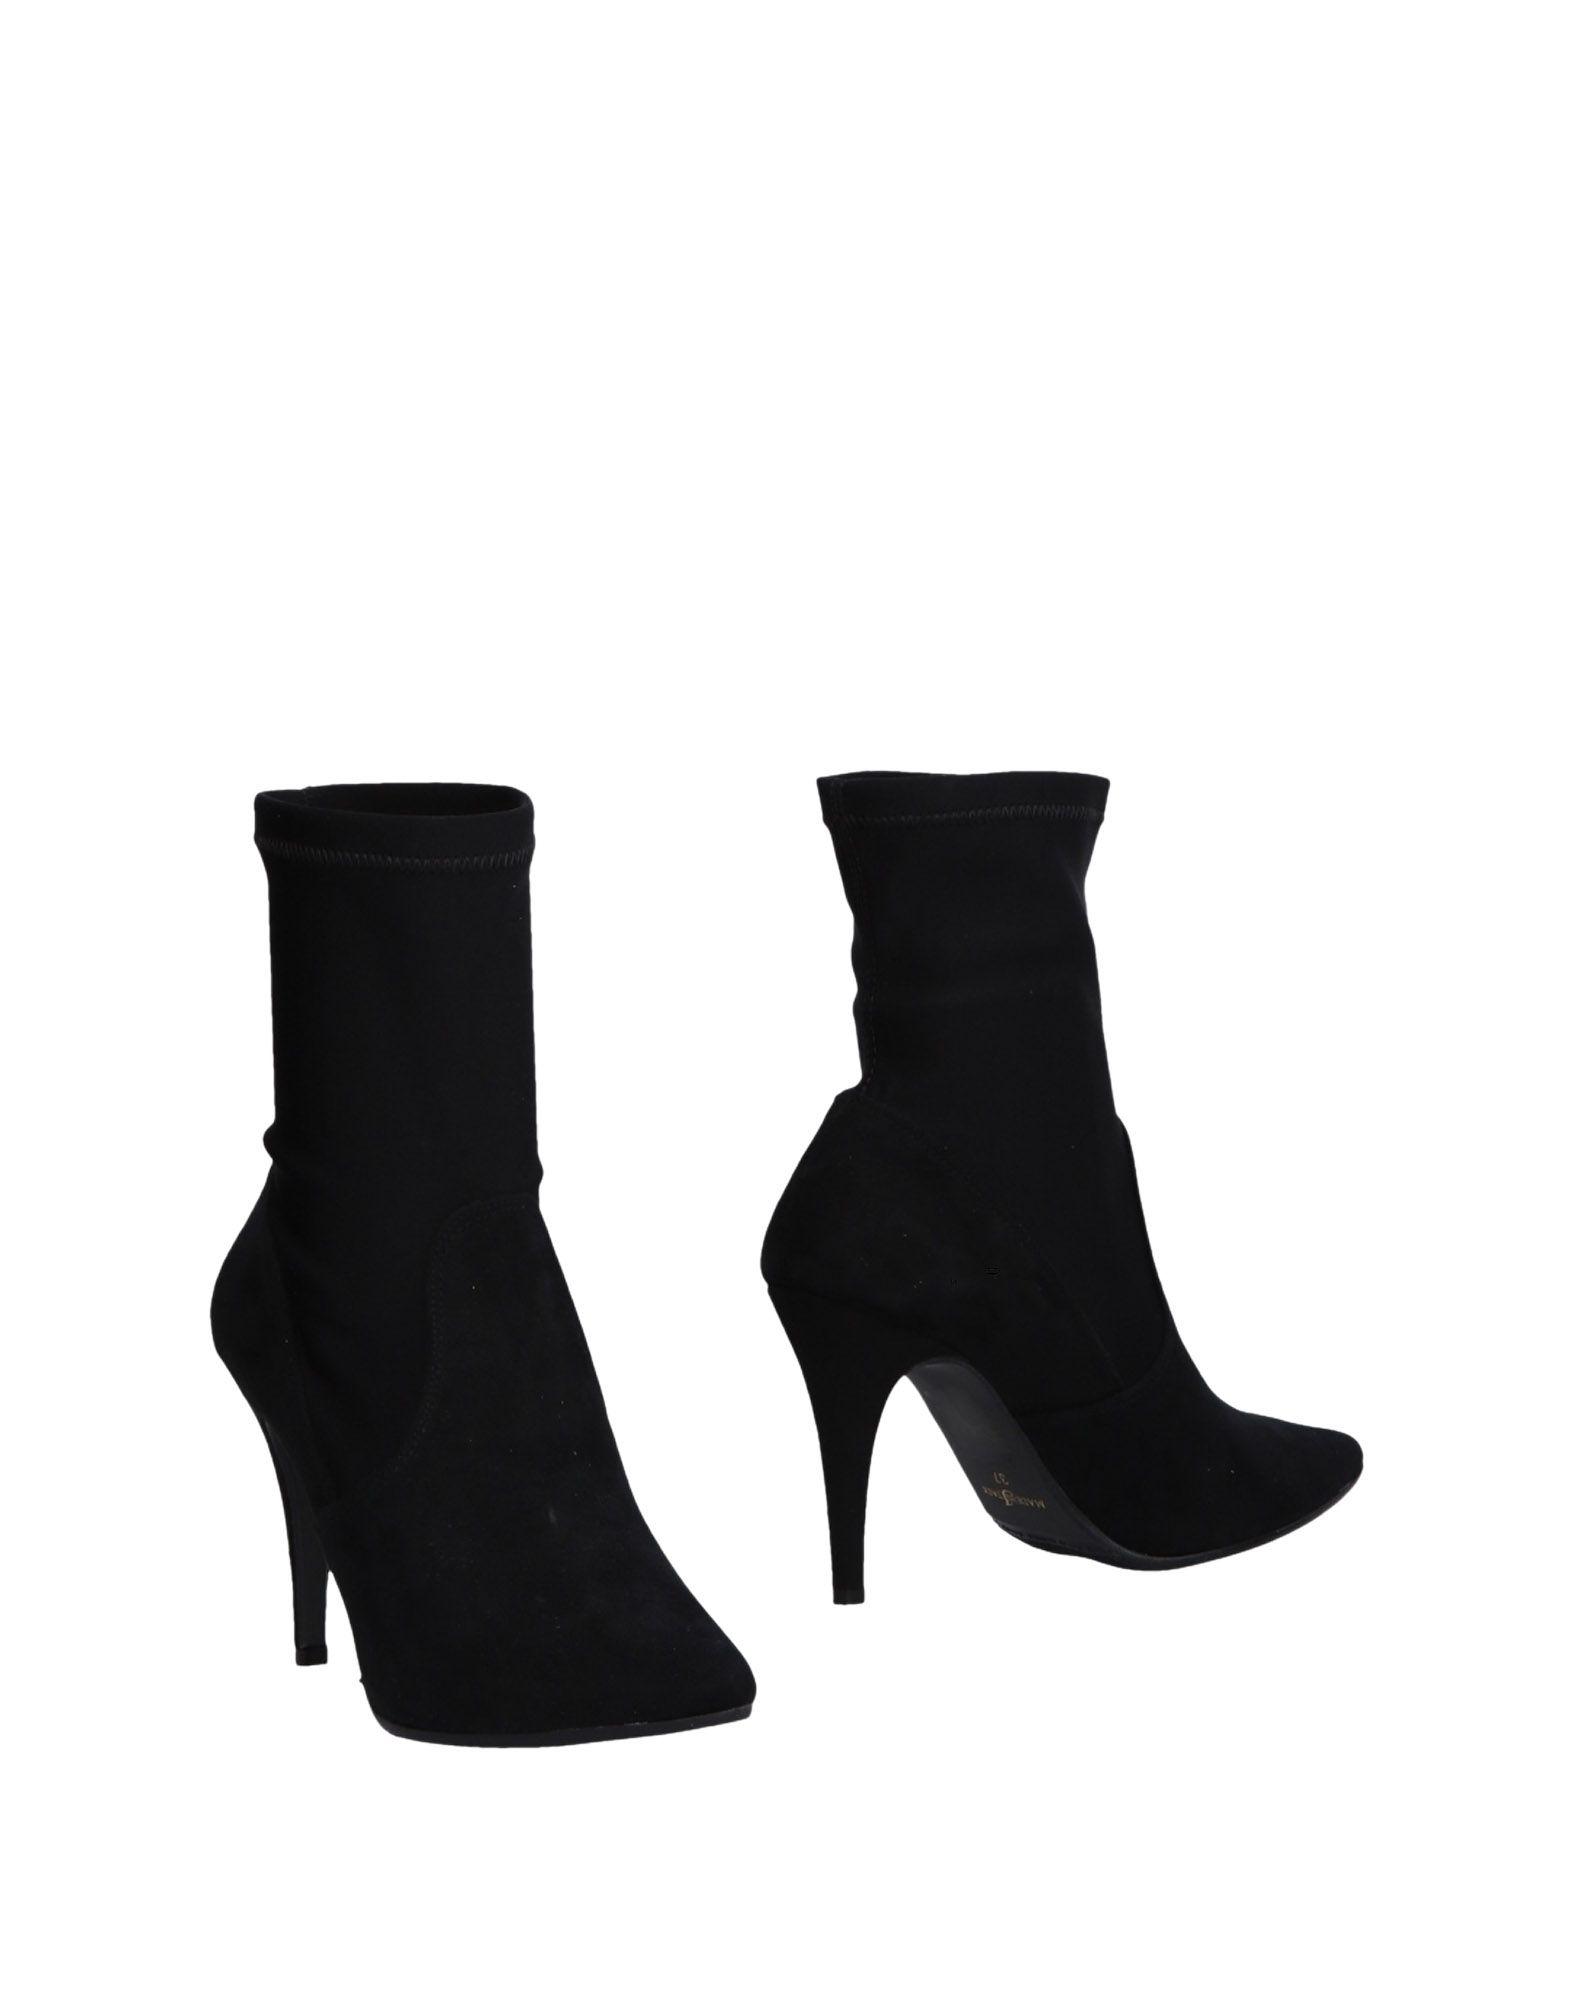 Nila & Nila Stiefelette Damen  11474957ON Gute Qualität beliebte Schuhe